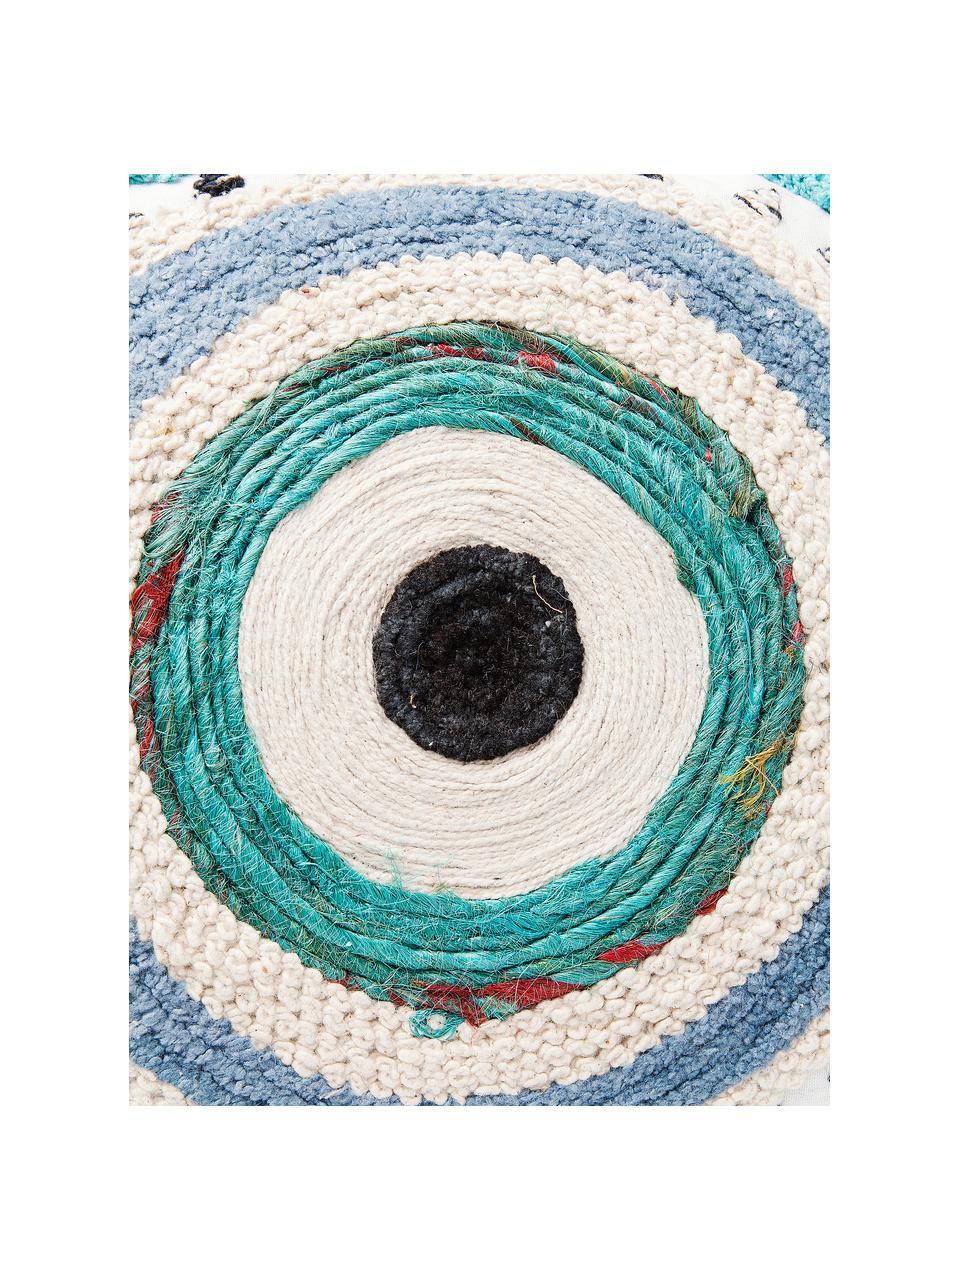 Coussin rectangulaire ethnique Ethno Eye, Blanc, beige, bleu